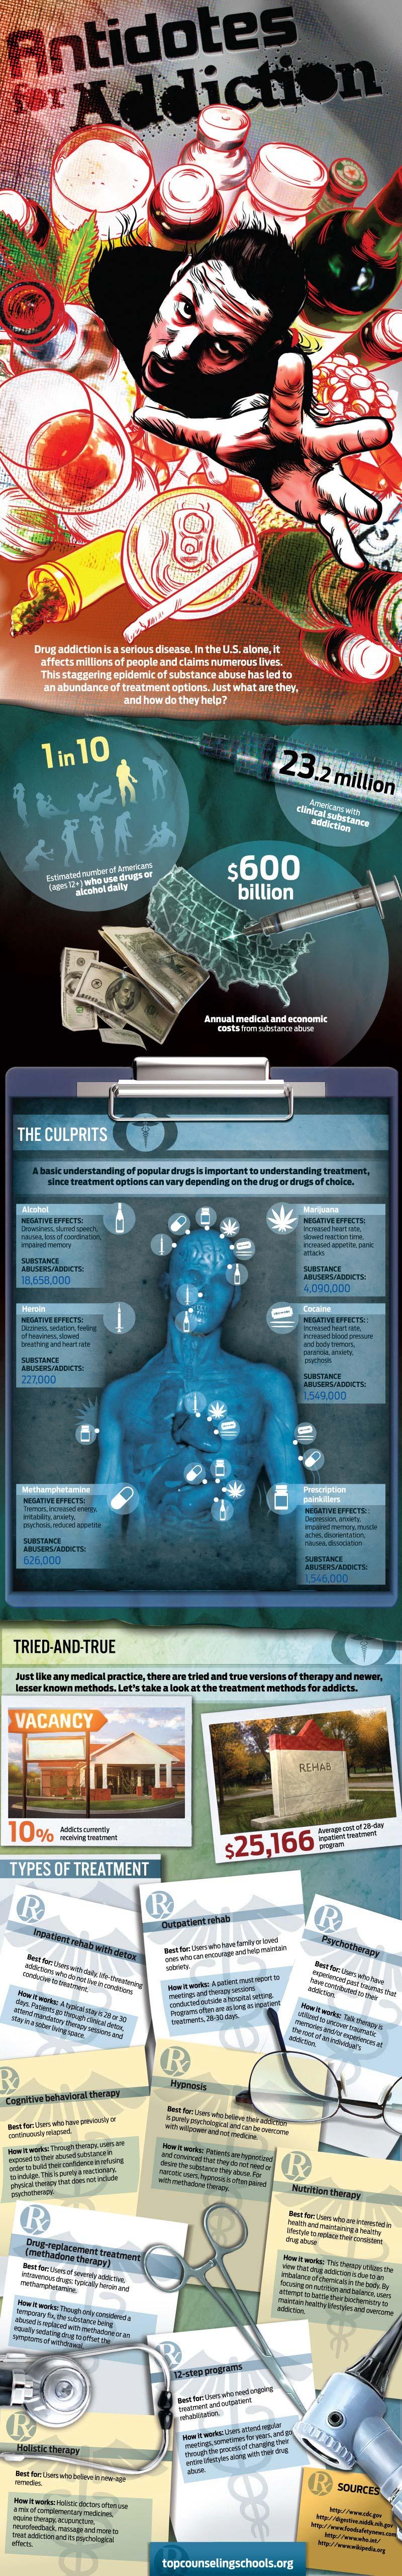 Methods of Fighting Drug Addiction-Infographic